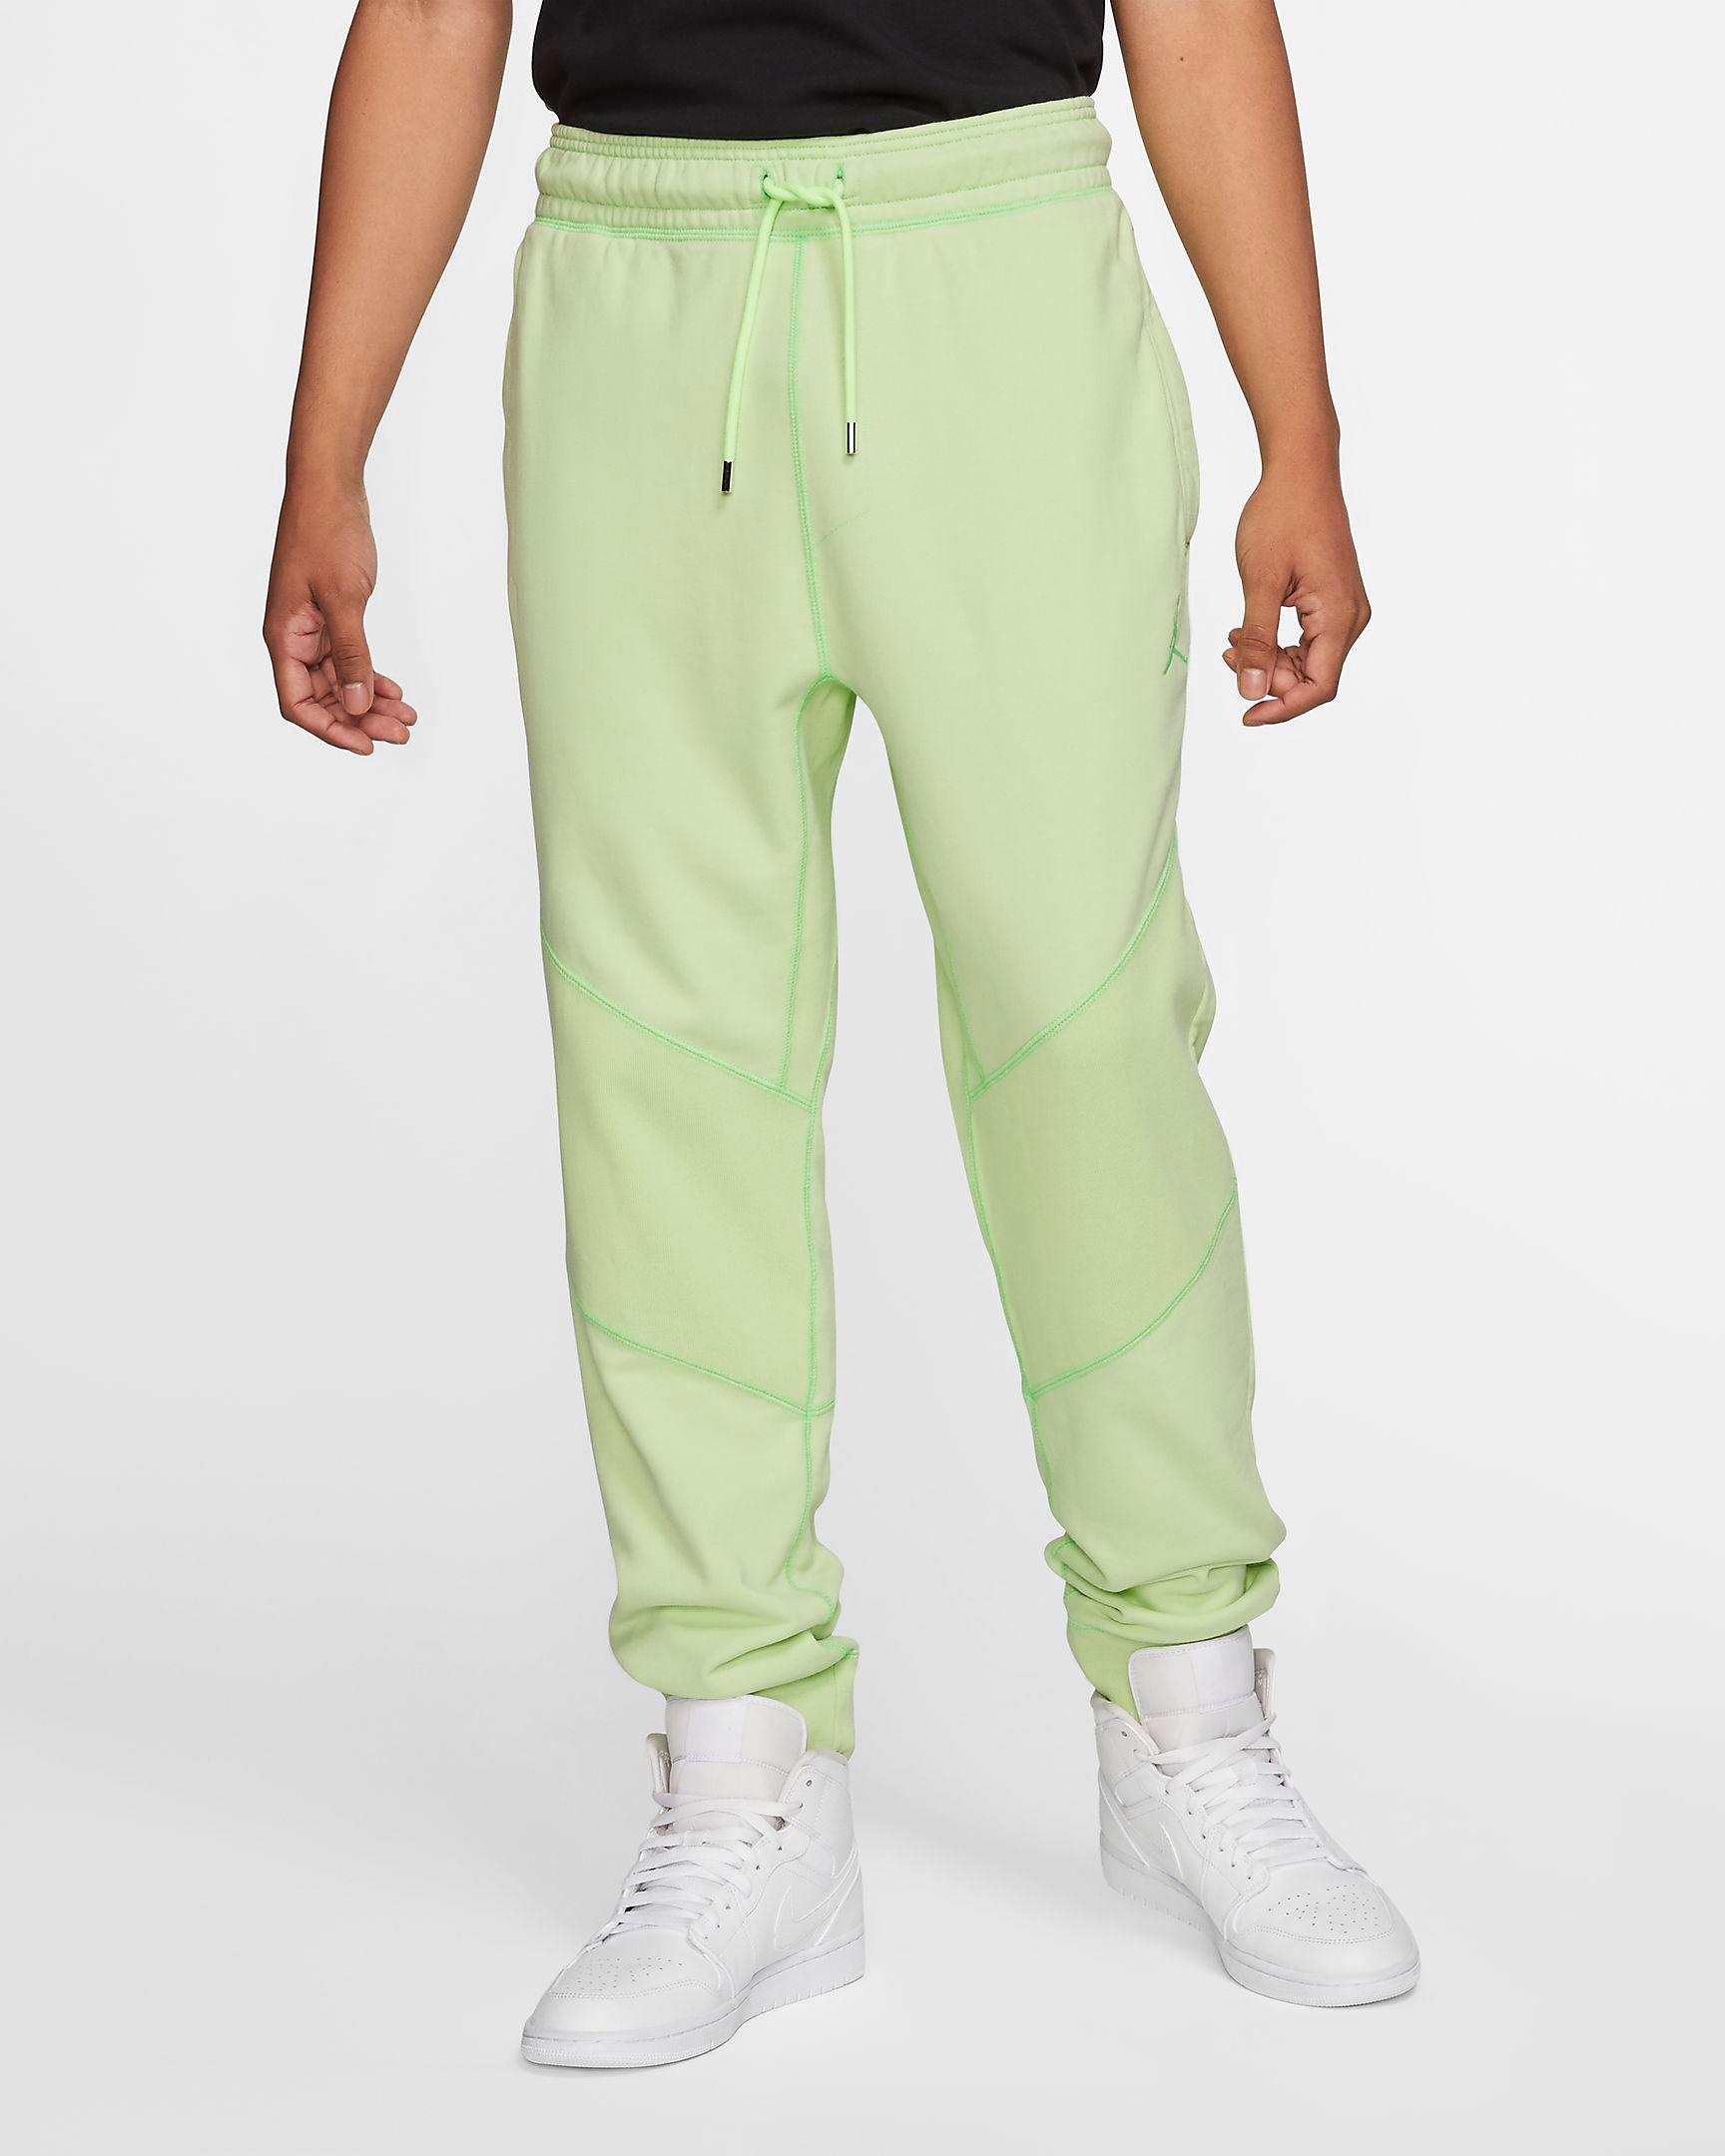 jordan-1-bio-hack-jogger-pant-match-green